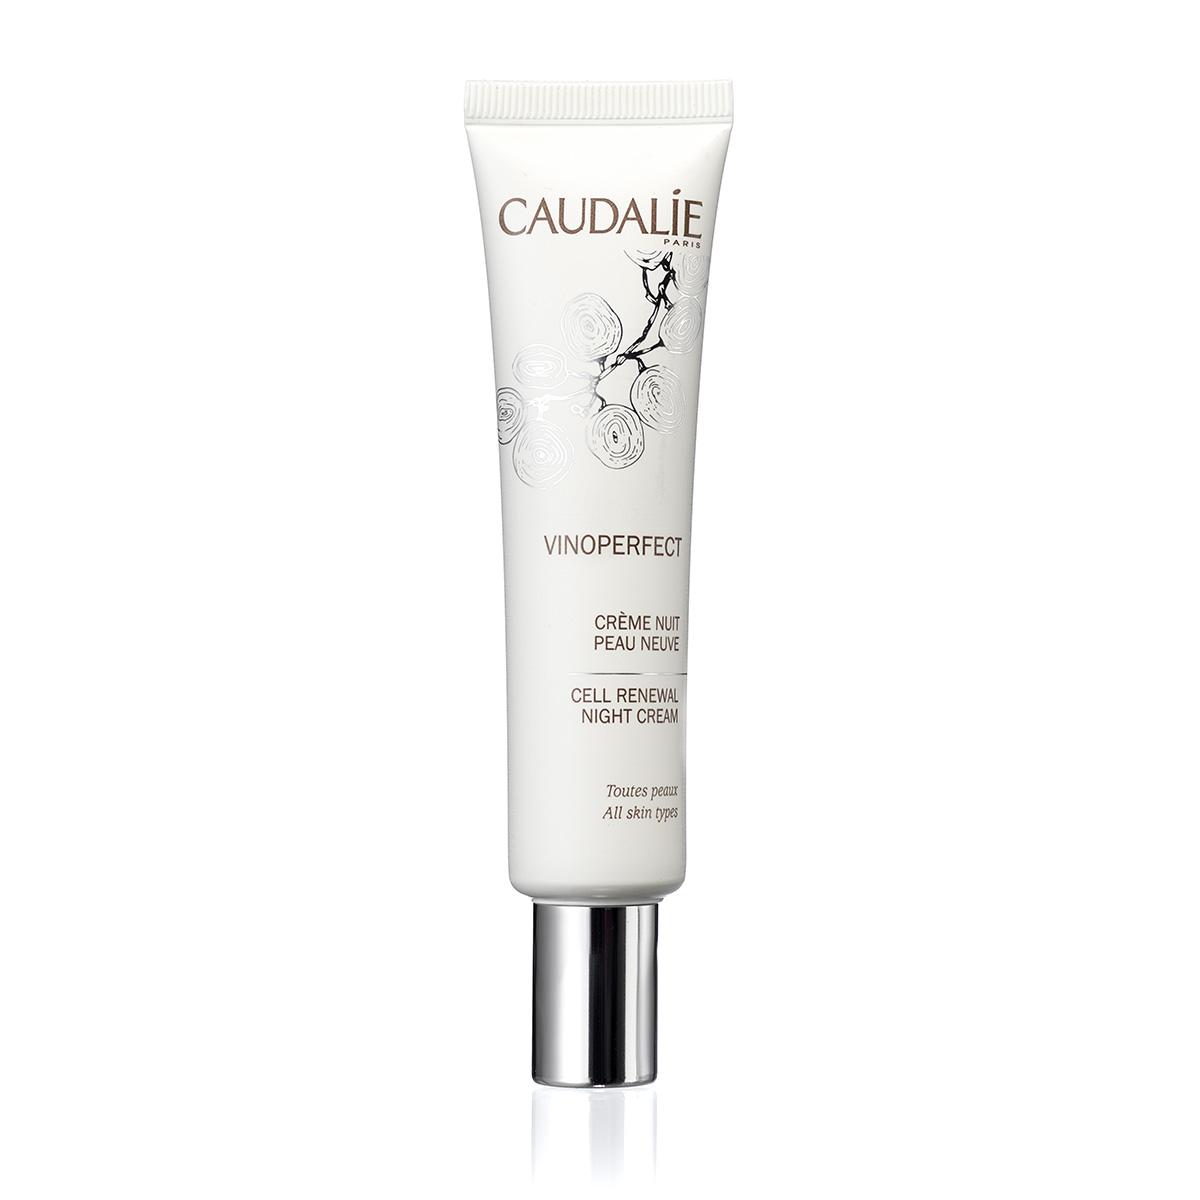 Billede af Caudalie Vinoperfect Cell Renewal Night Cream - 40 ml